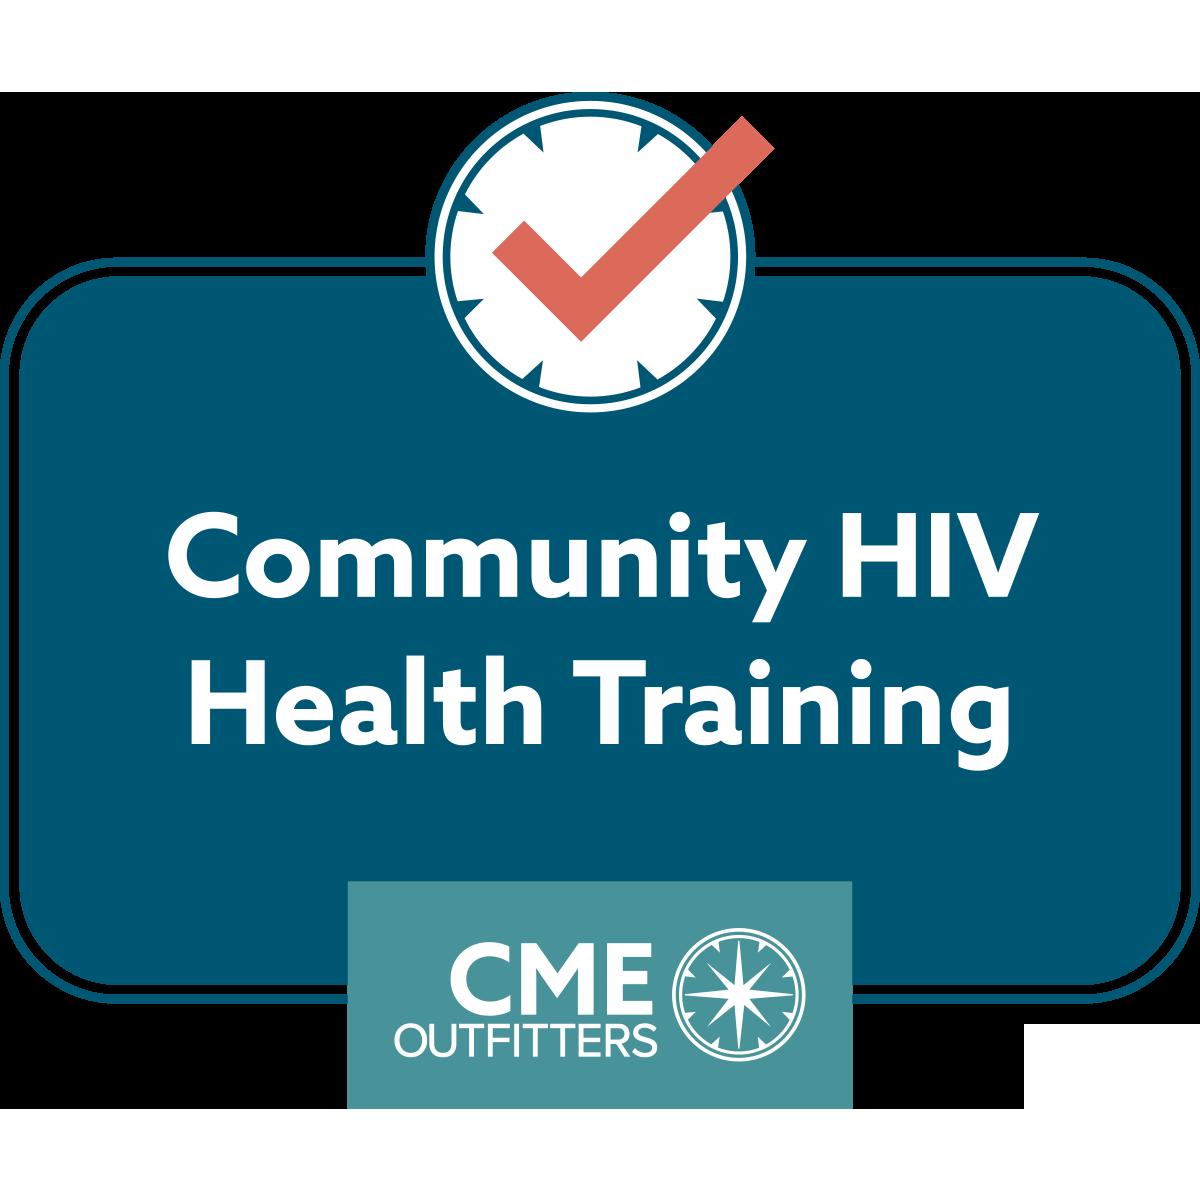 Community HIV Health Training